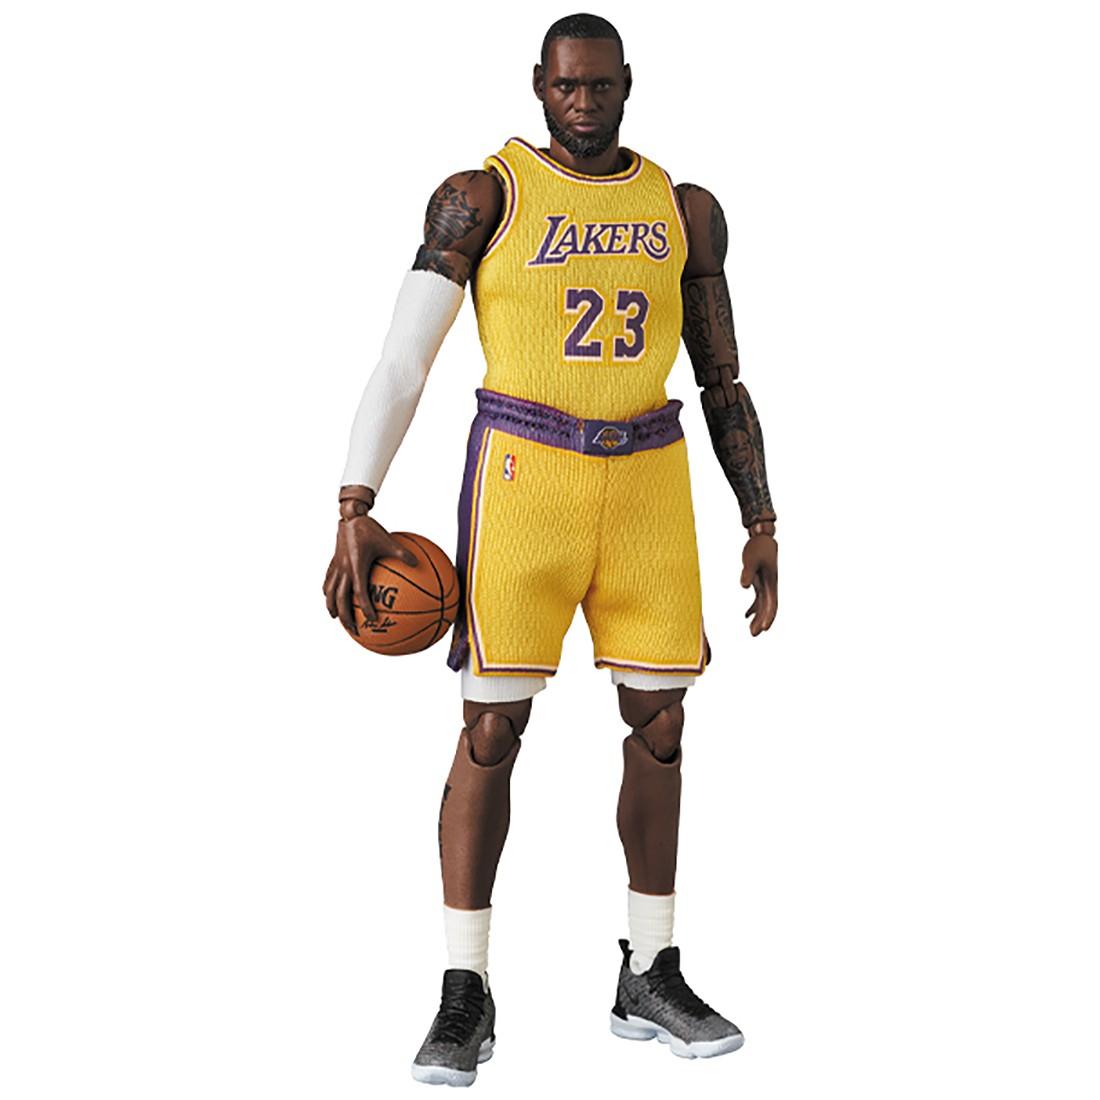 PREORDER - Medicom MAFEX NBA Los Angeles Lakers LeBron James Figure (yellow)